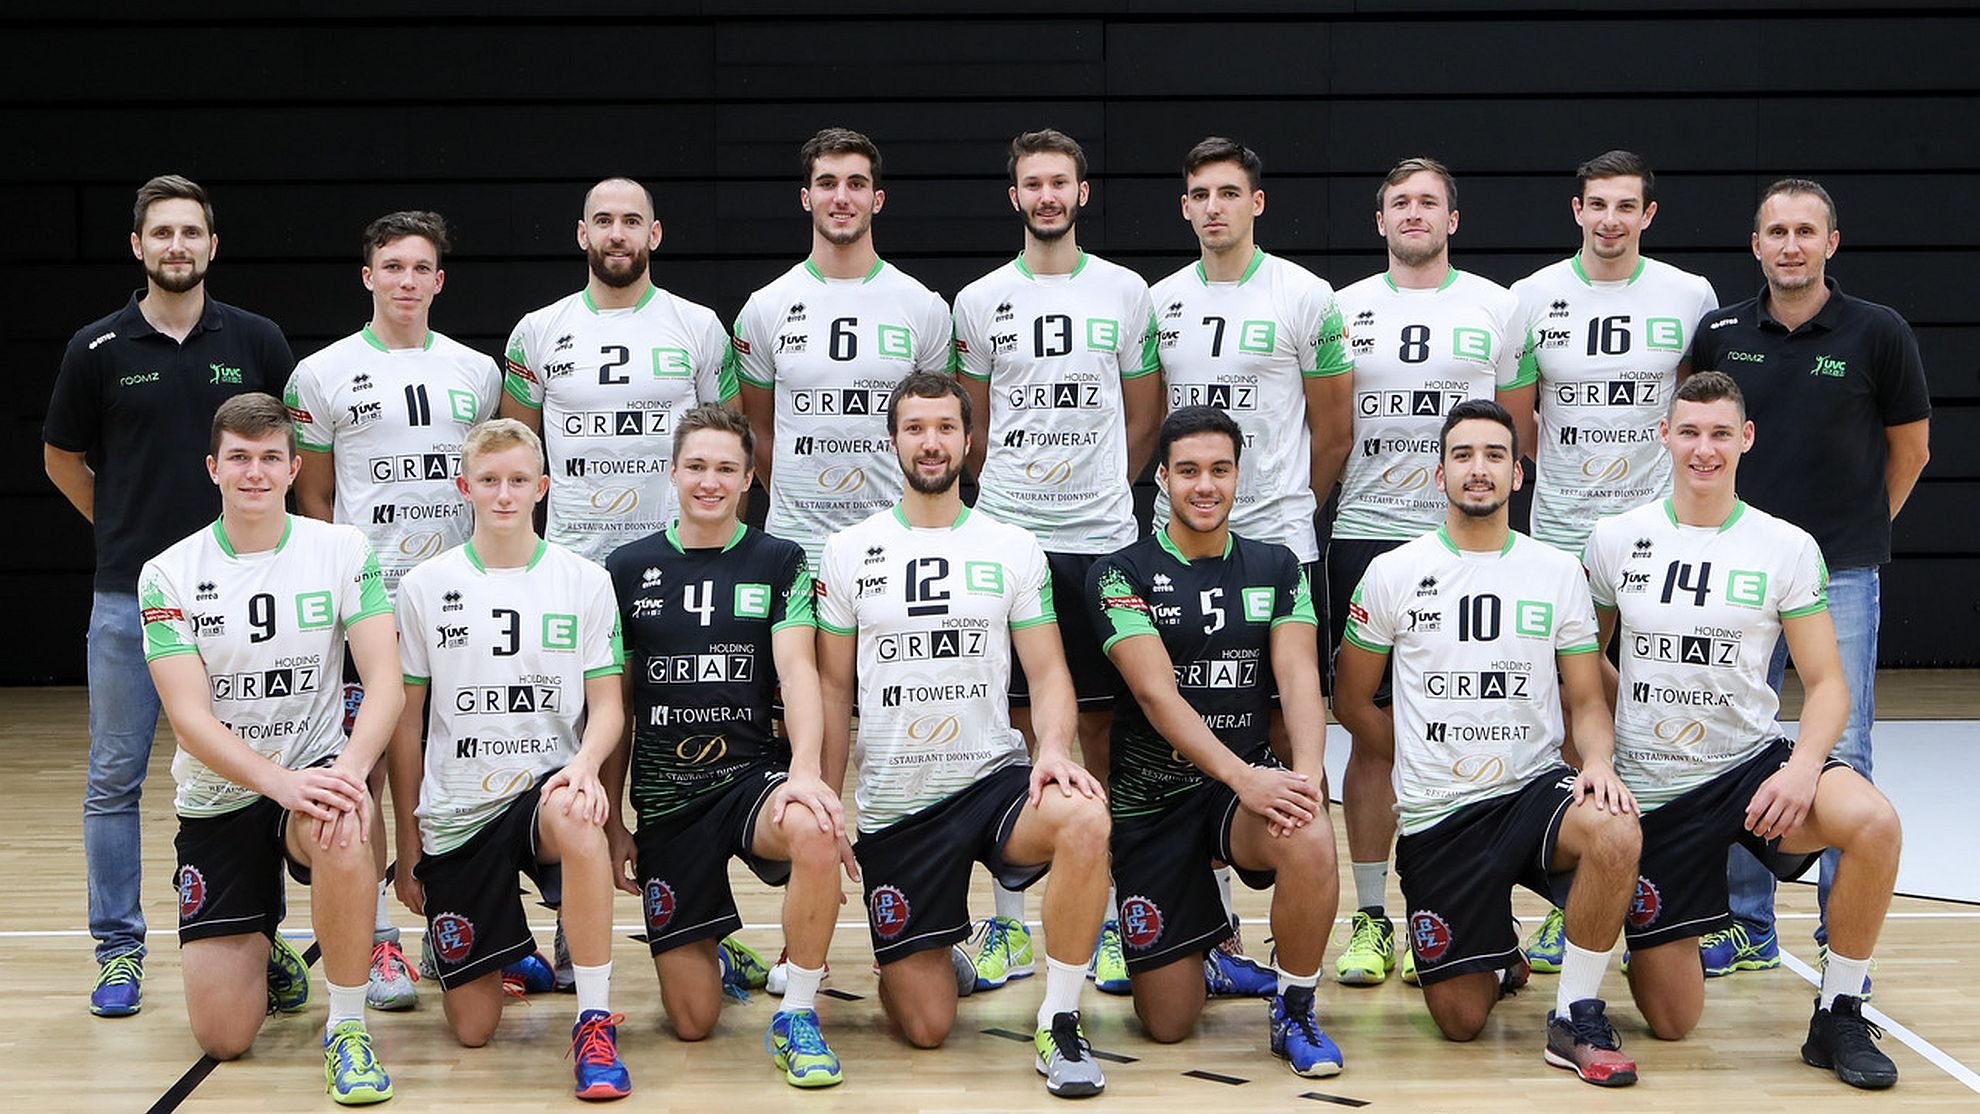 UVC Holding Graz 2018 © GEPA pictures